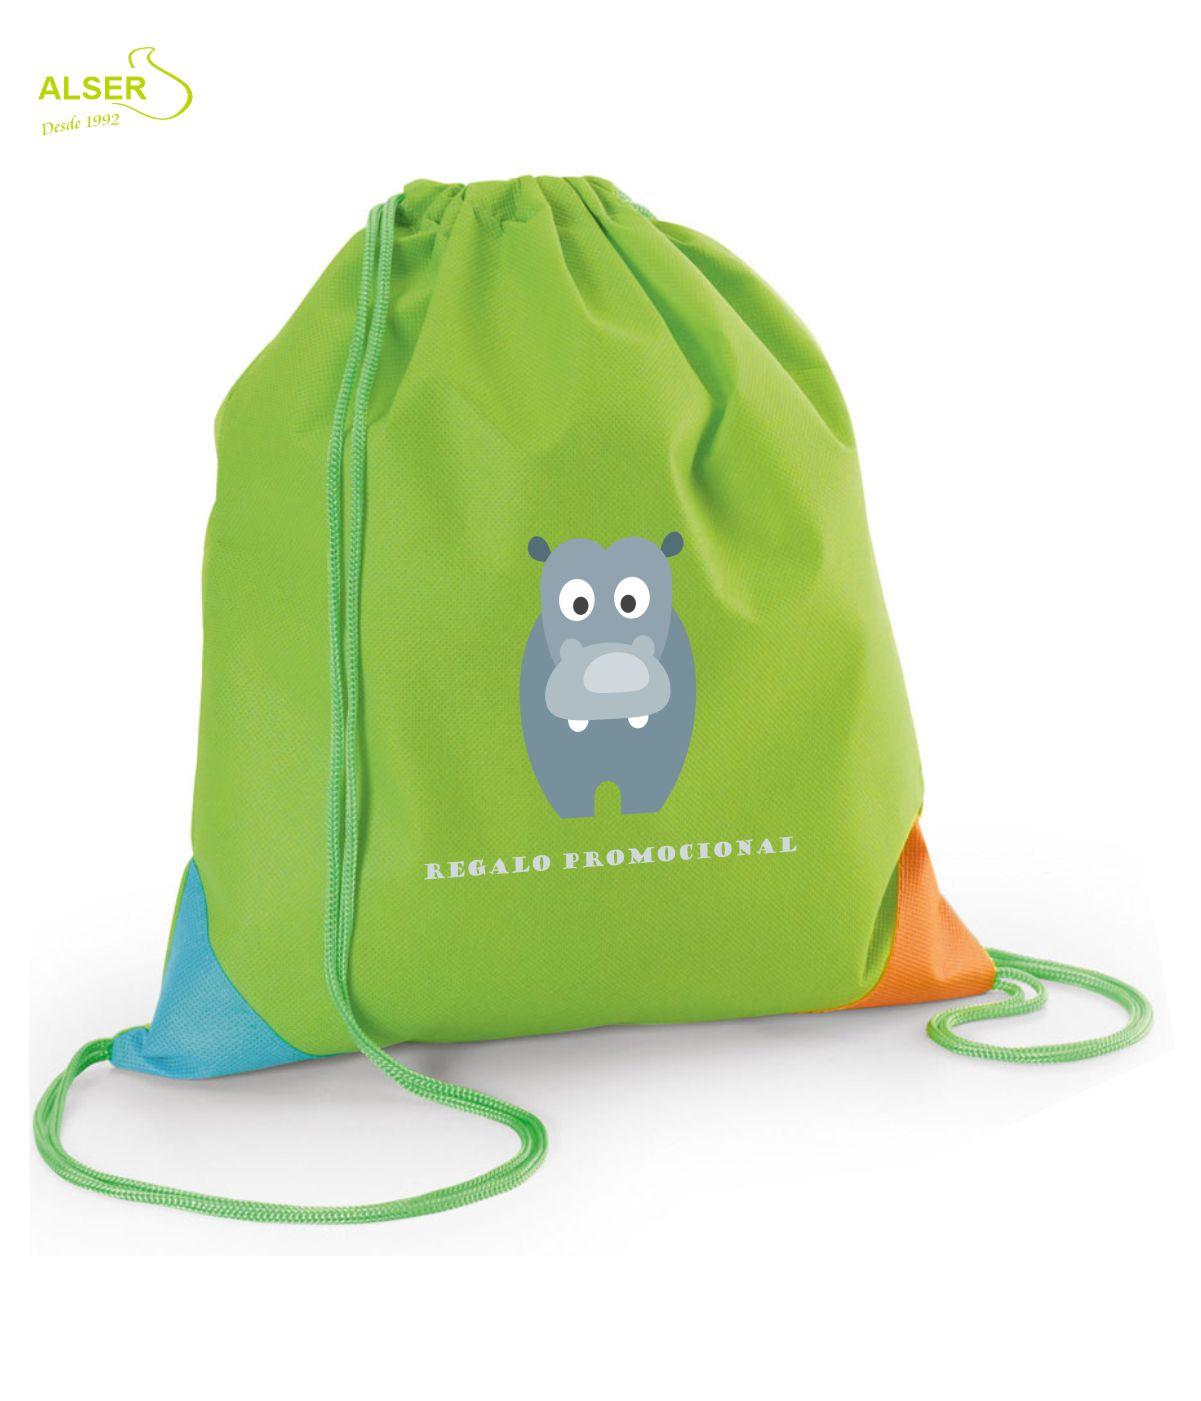 Mochila saco infantil para publicidad. Verde